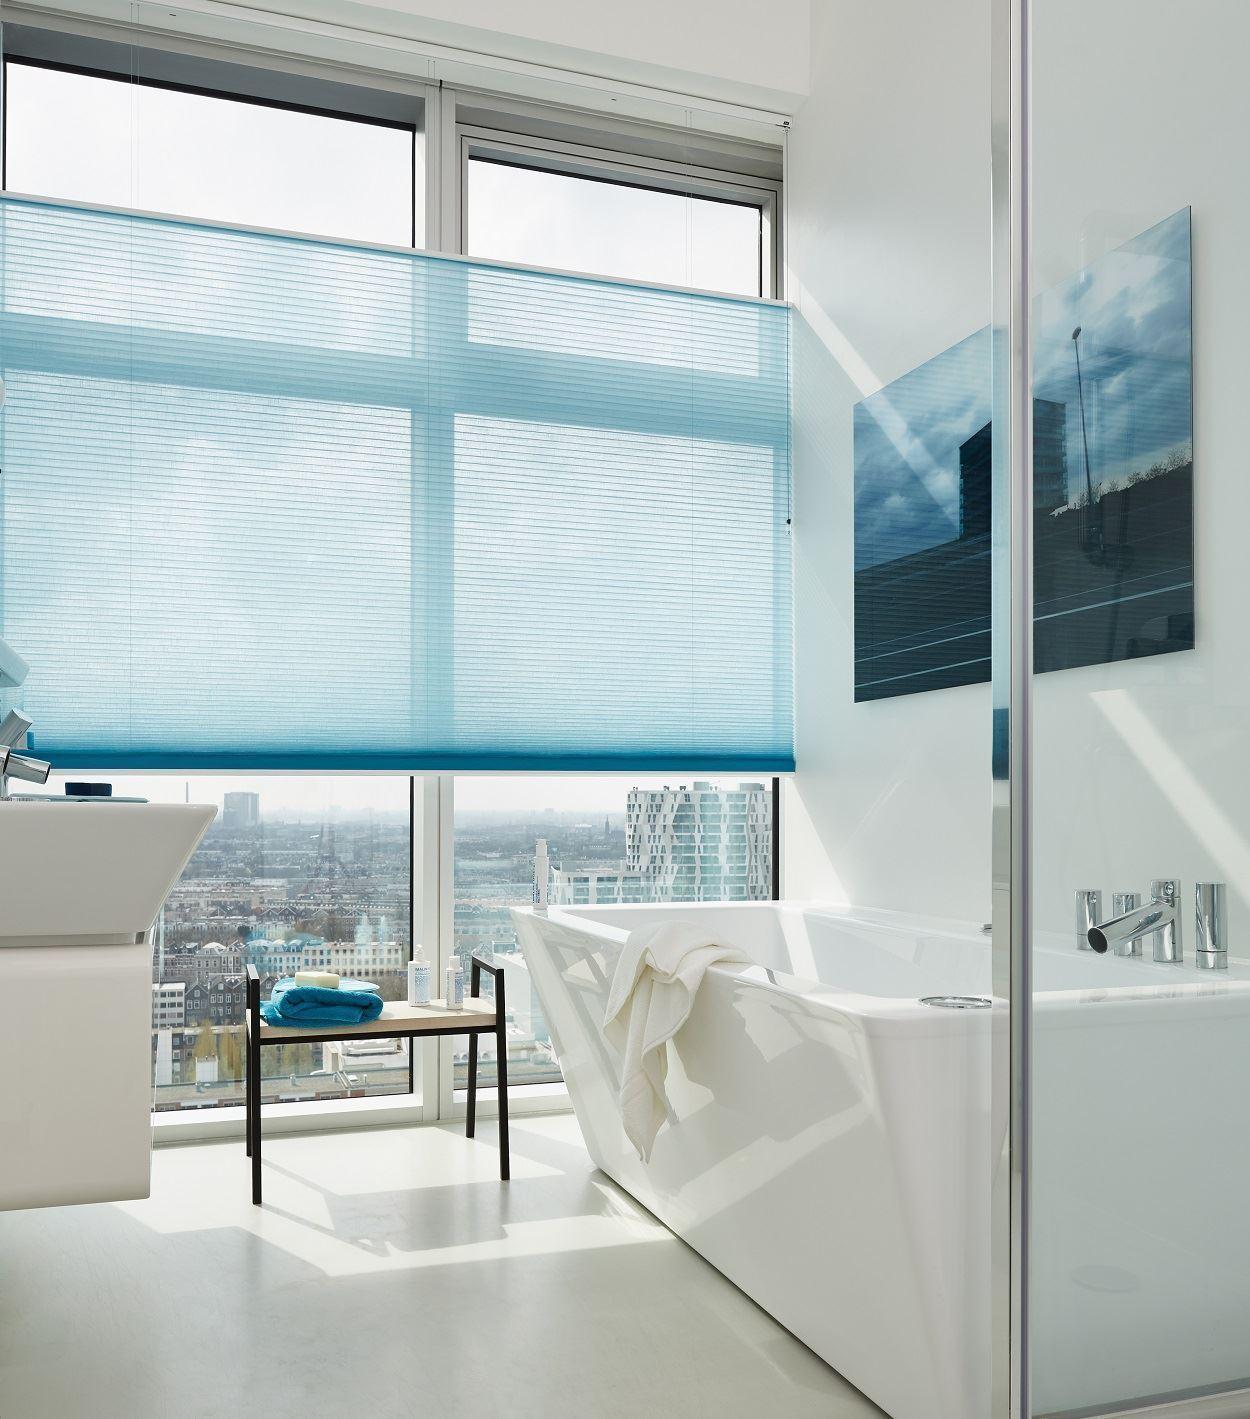 Afbeelding van Luxaflex® Duette Shades 64 mm Top Down Bottom Up&Literise